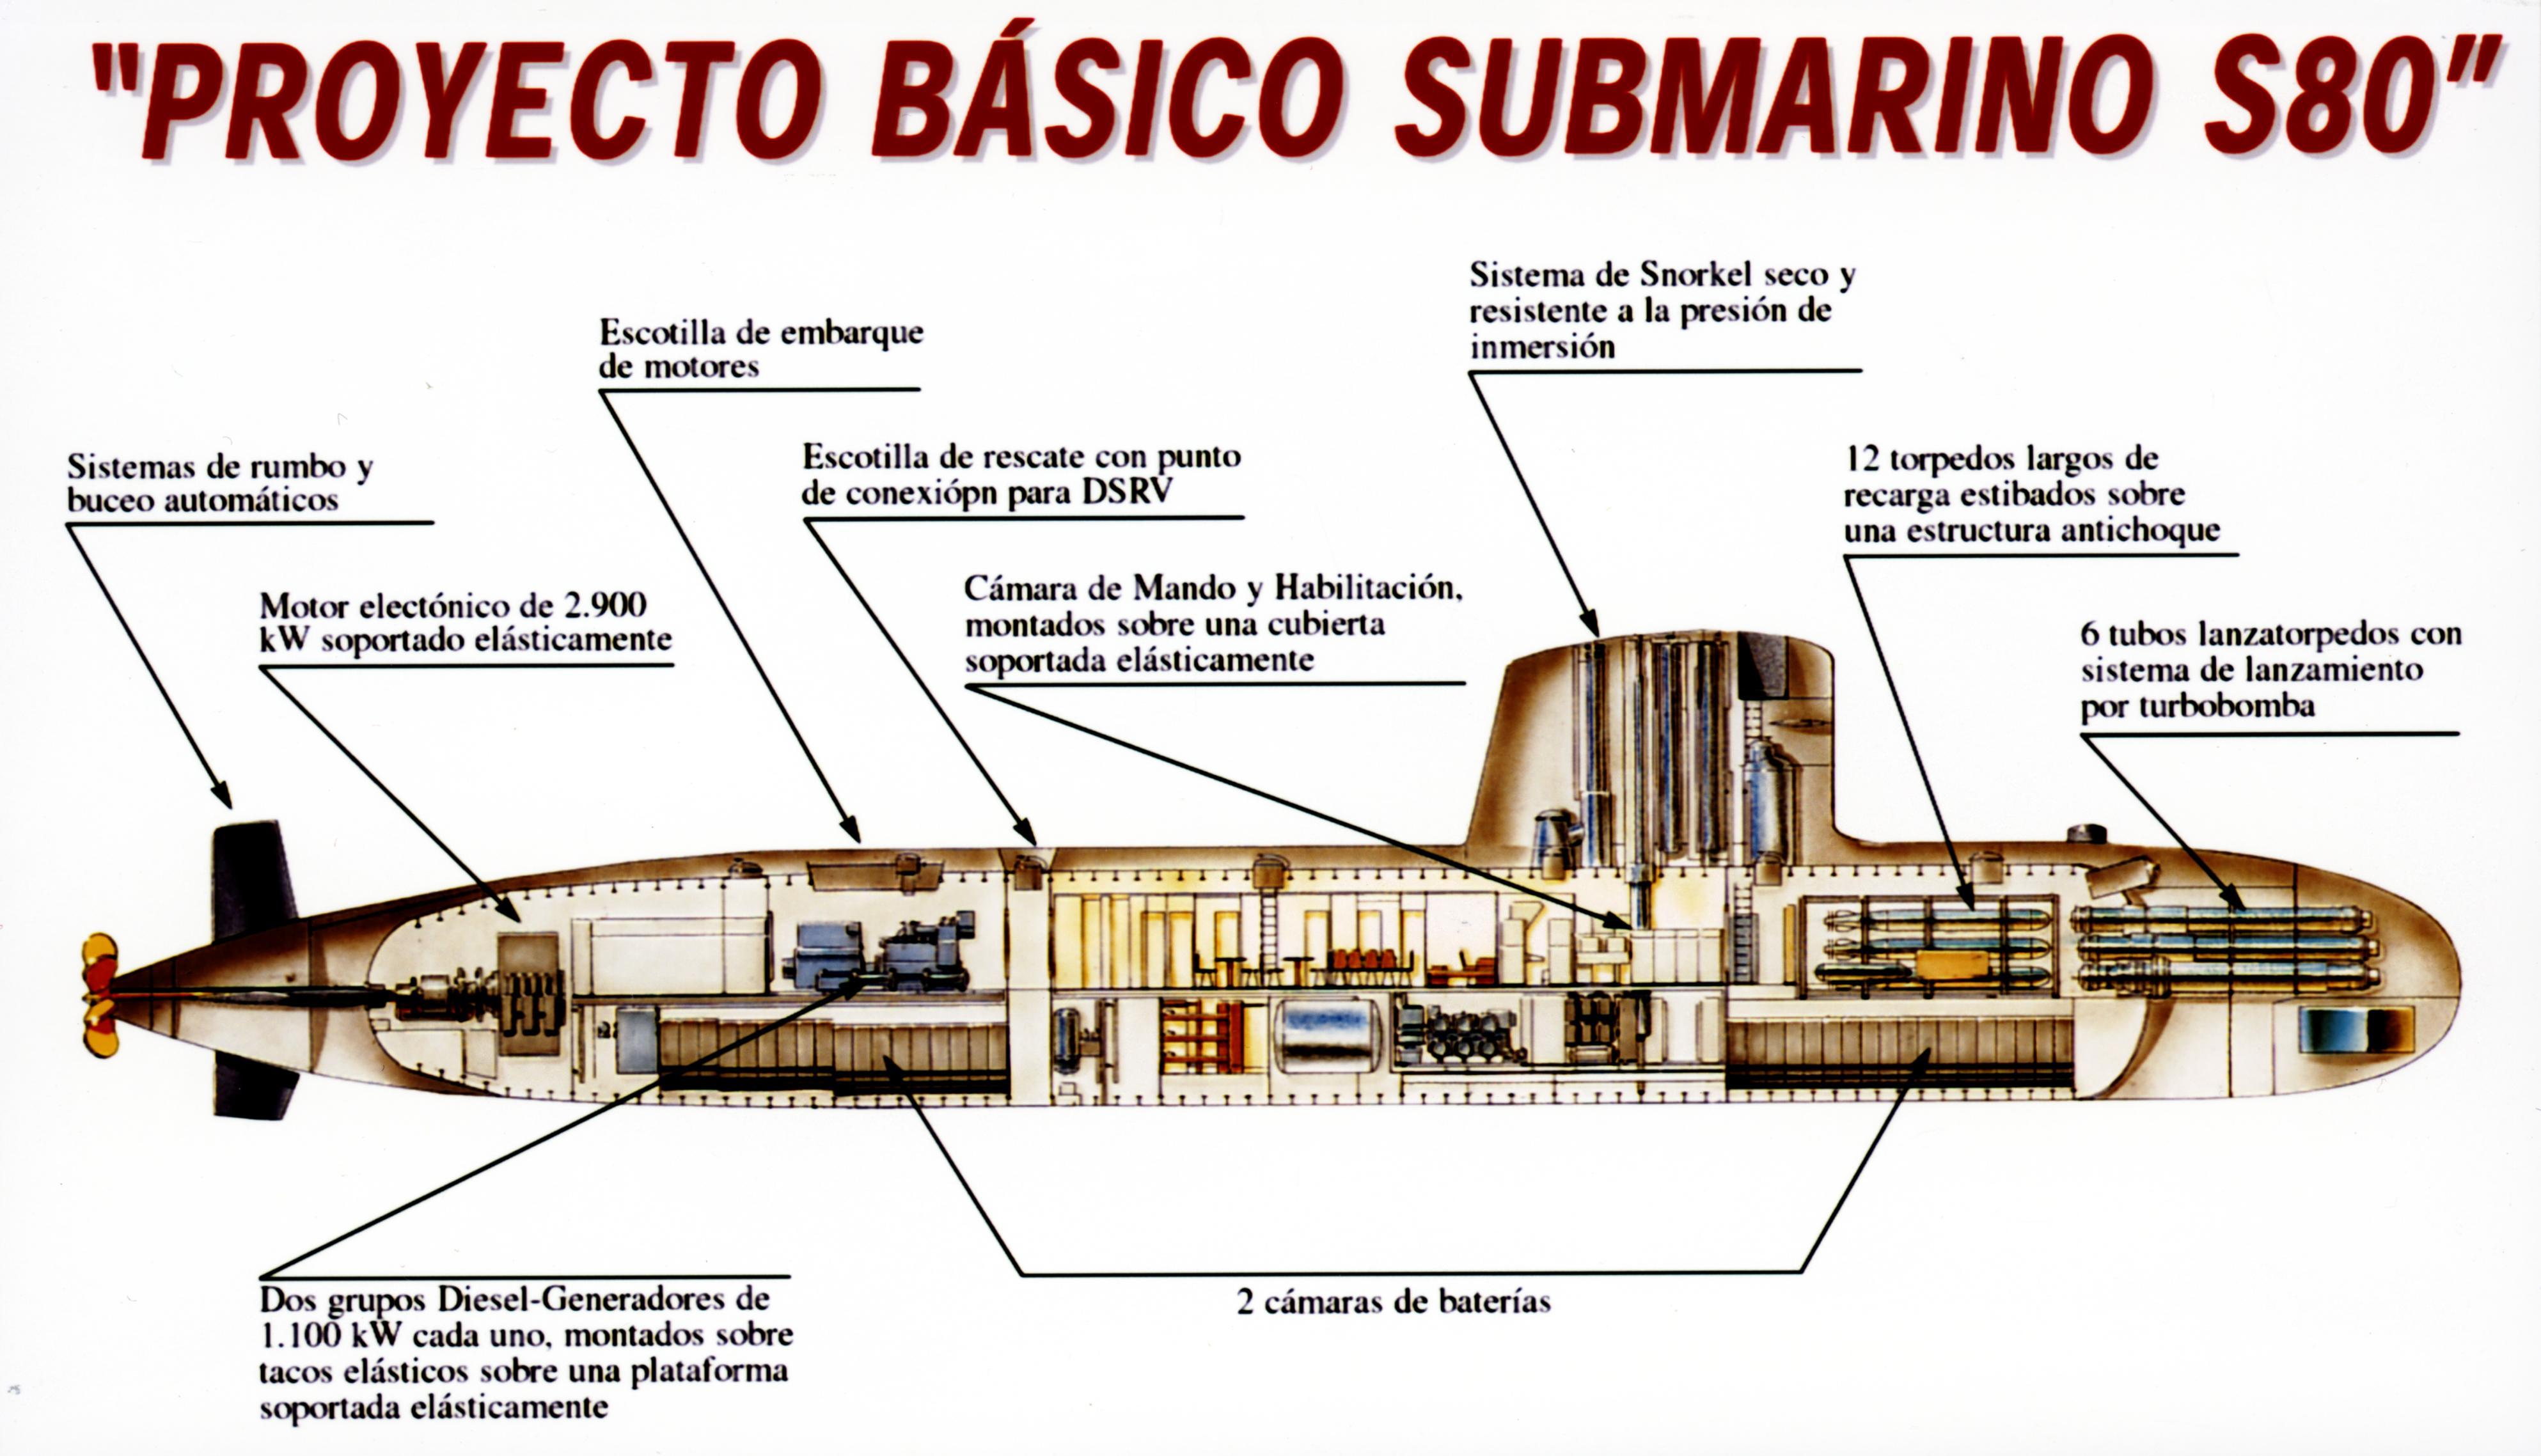 Todo Sobre Barcos Of El Submarino S 80 Ya Flota Pero Abengoa Sigue Sin